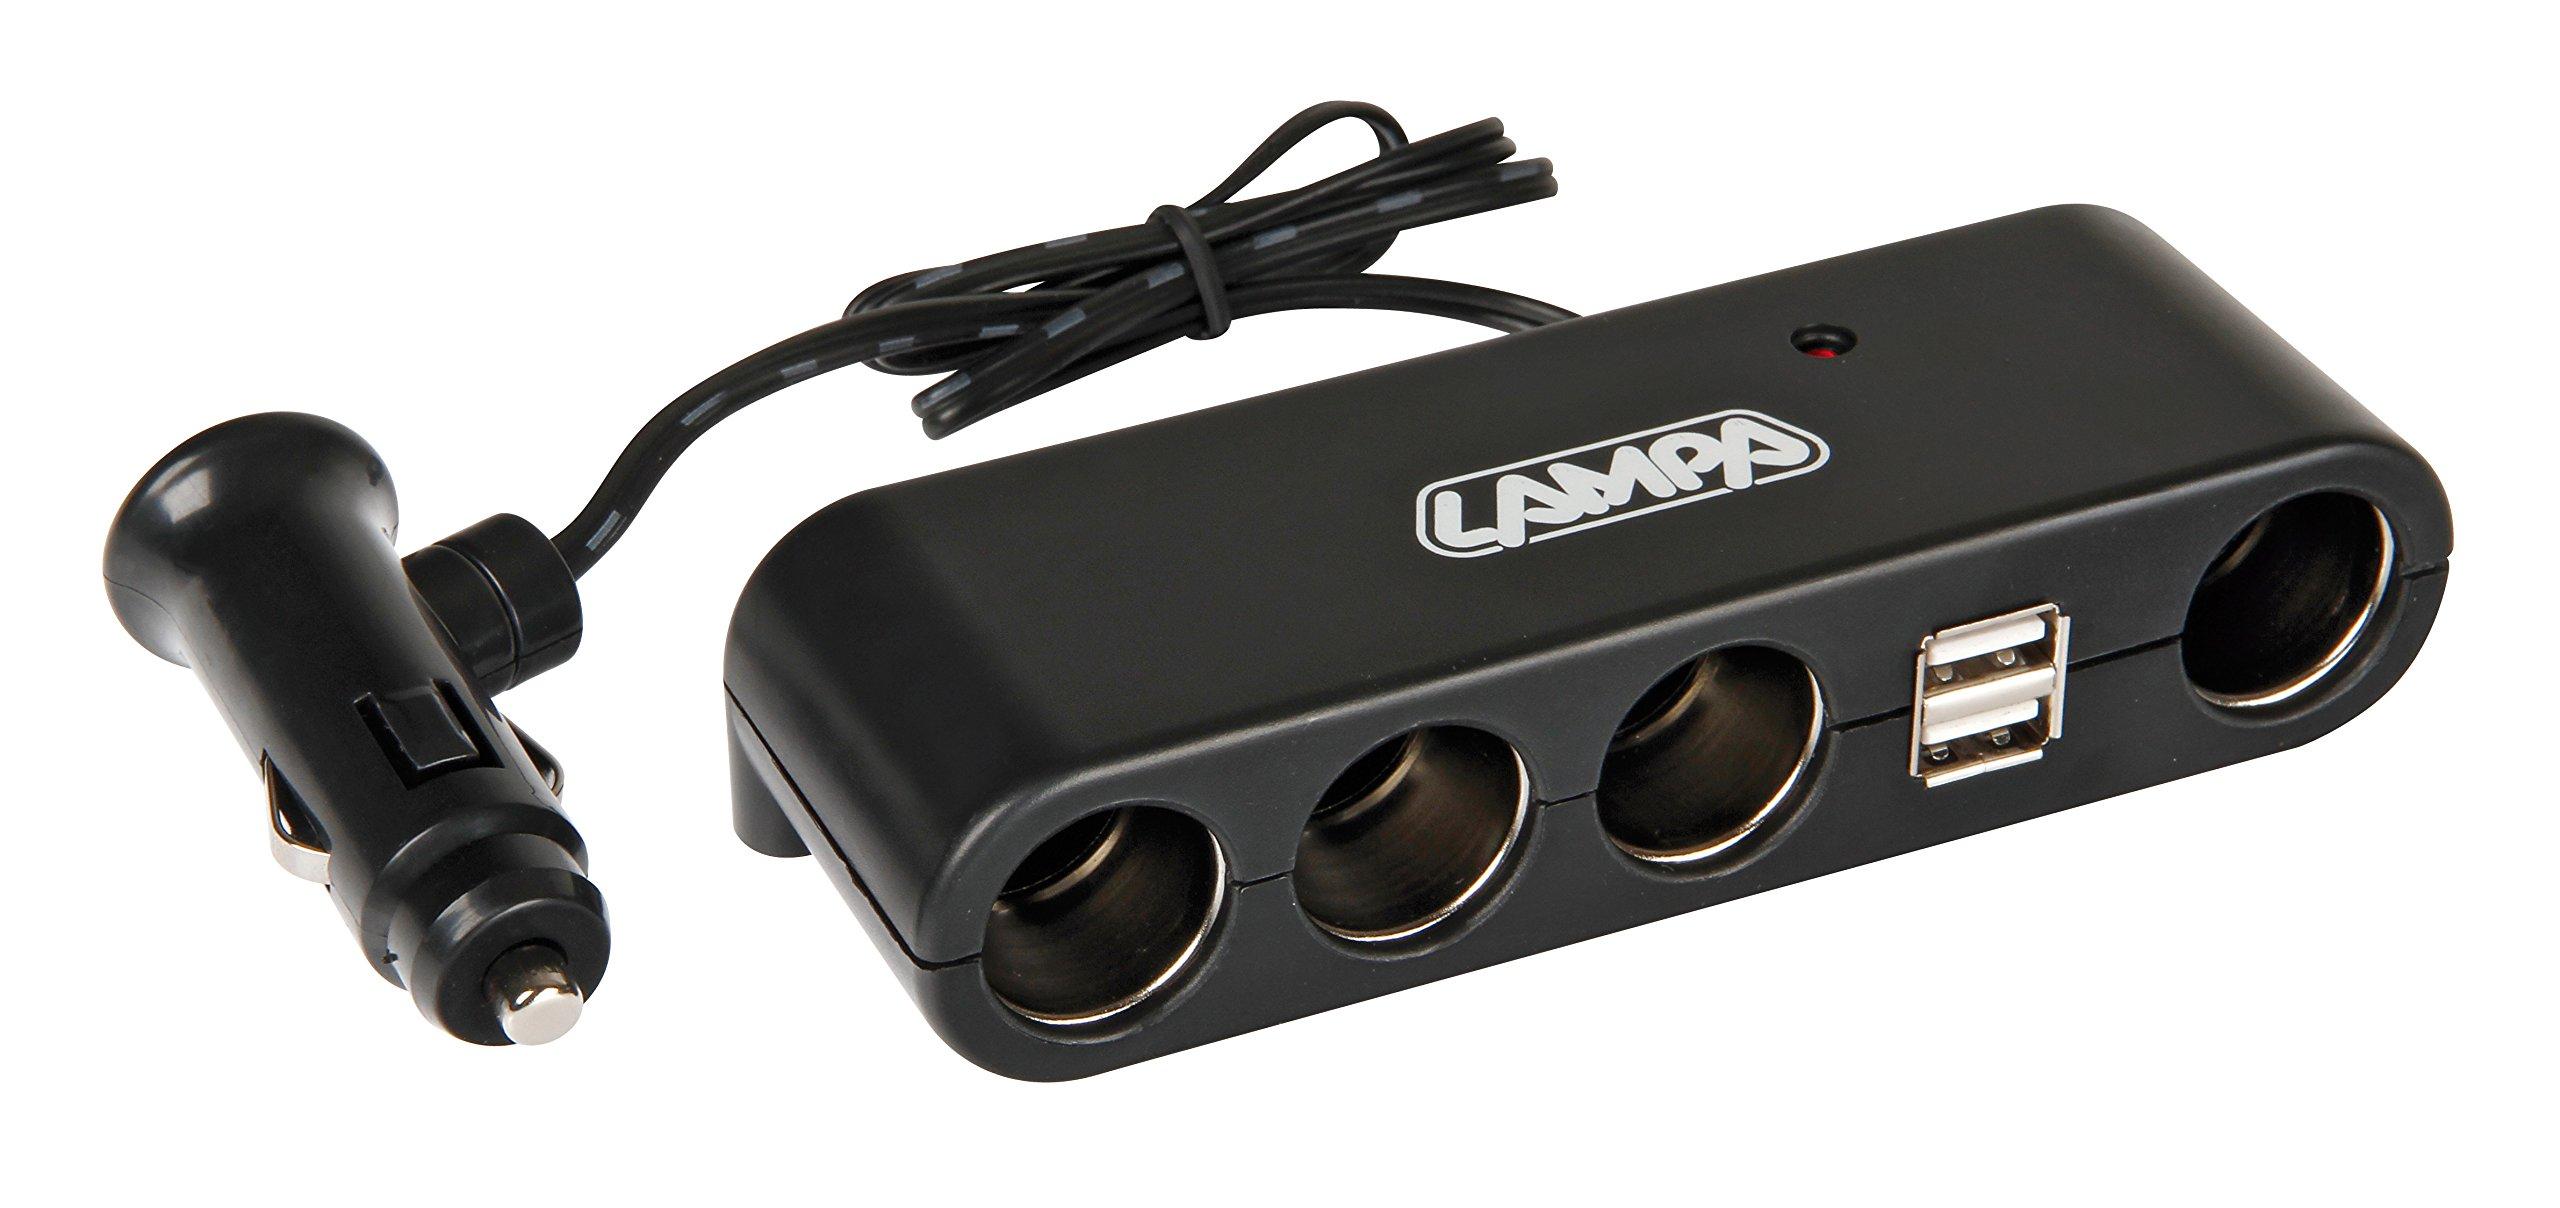 Lampa-39024-Stecker-multi-socket-1224-V-4-2